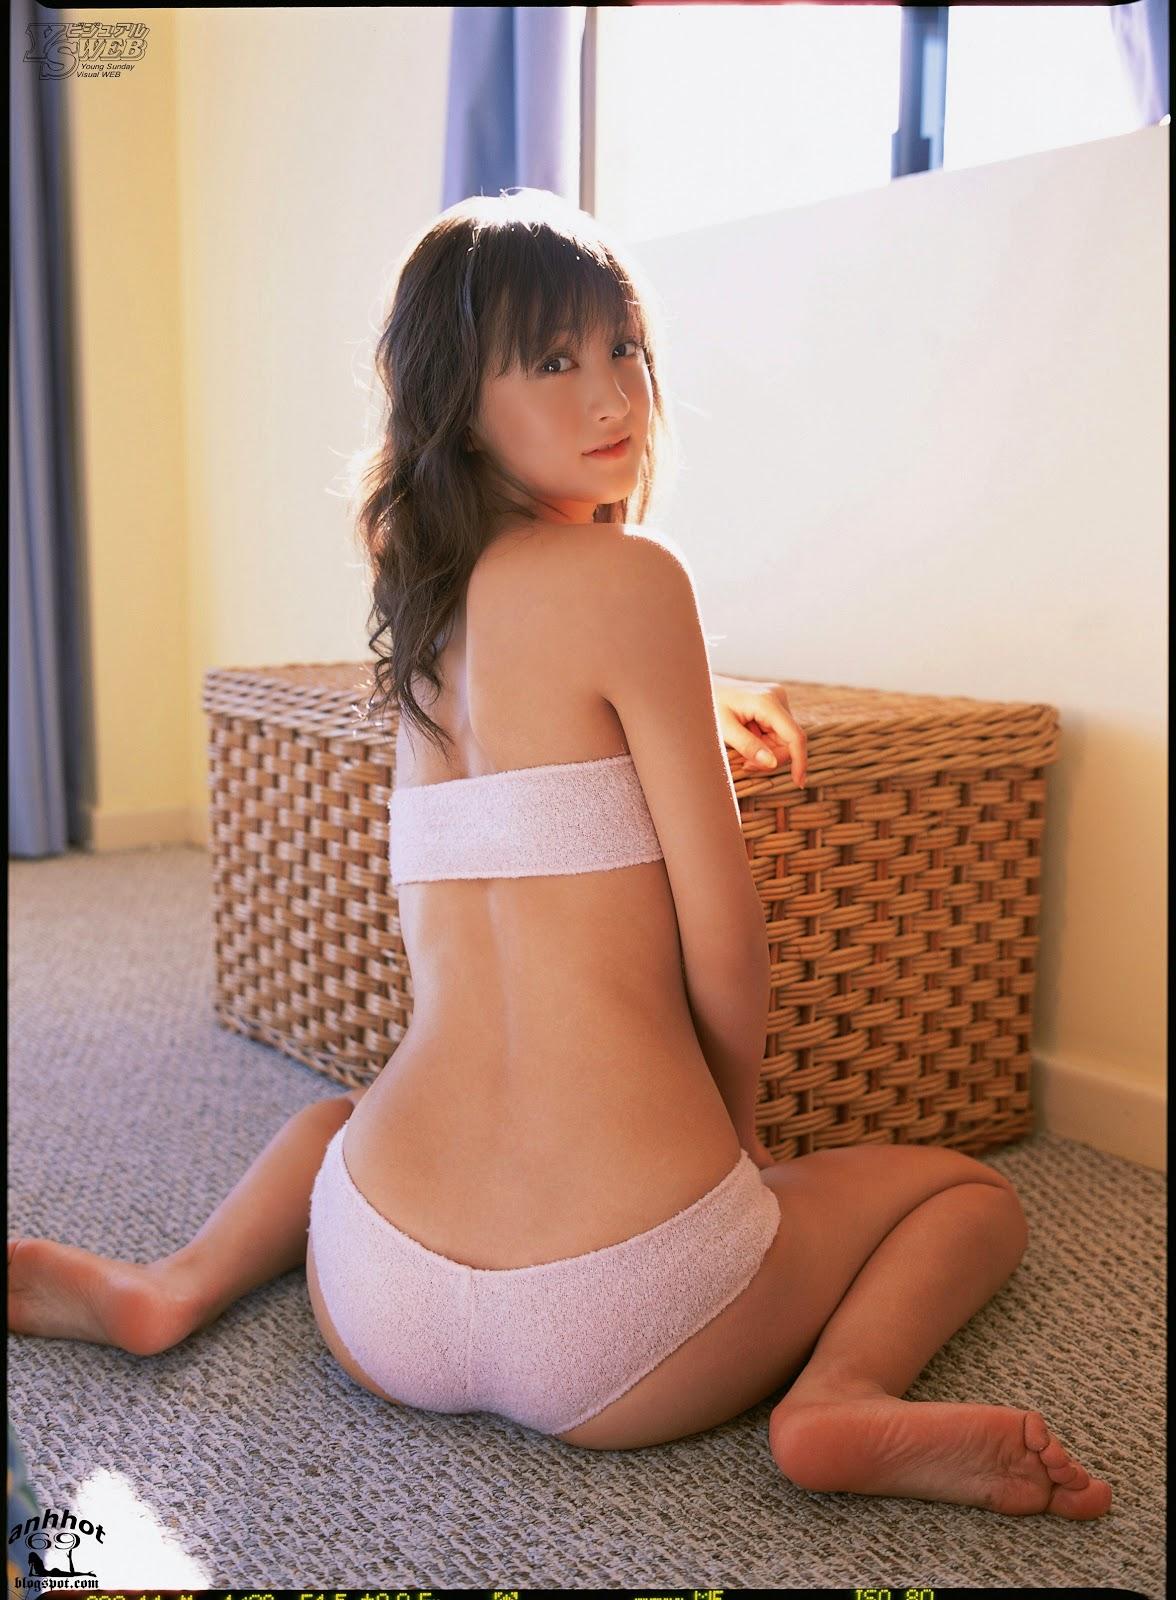 ayaka-komatsu-00403964